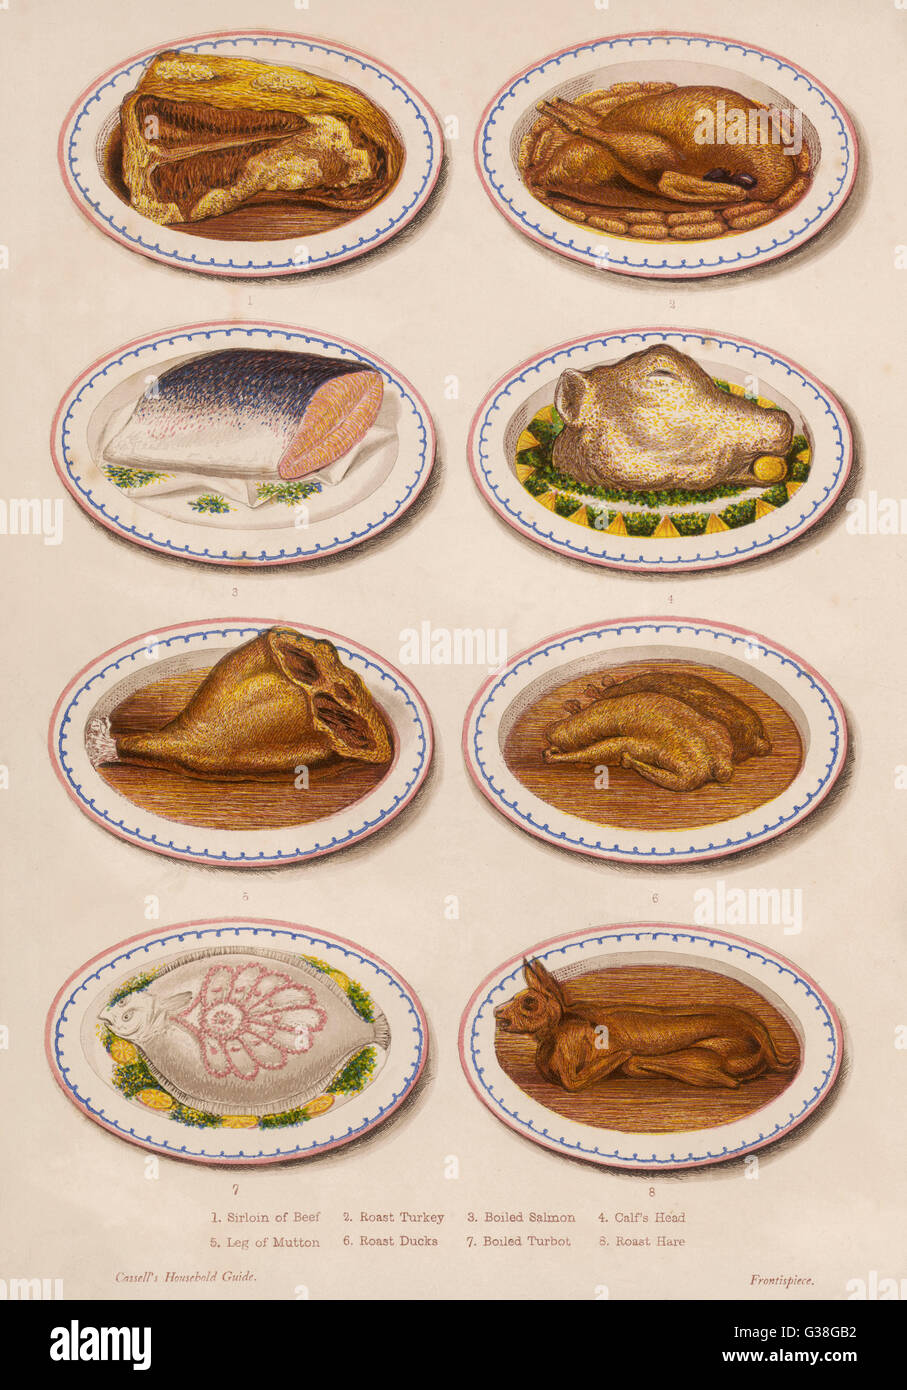 Sirloin of beef, roast turkey,  boiled salmon, calf's head,  leg of mutton, roast ducks,  boiled turbot, roast - Stock Image